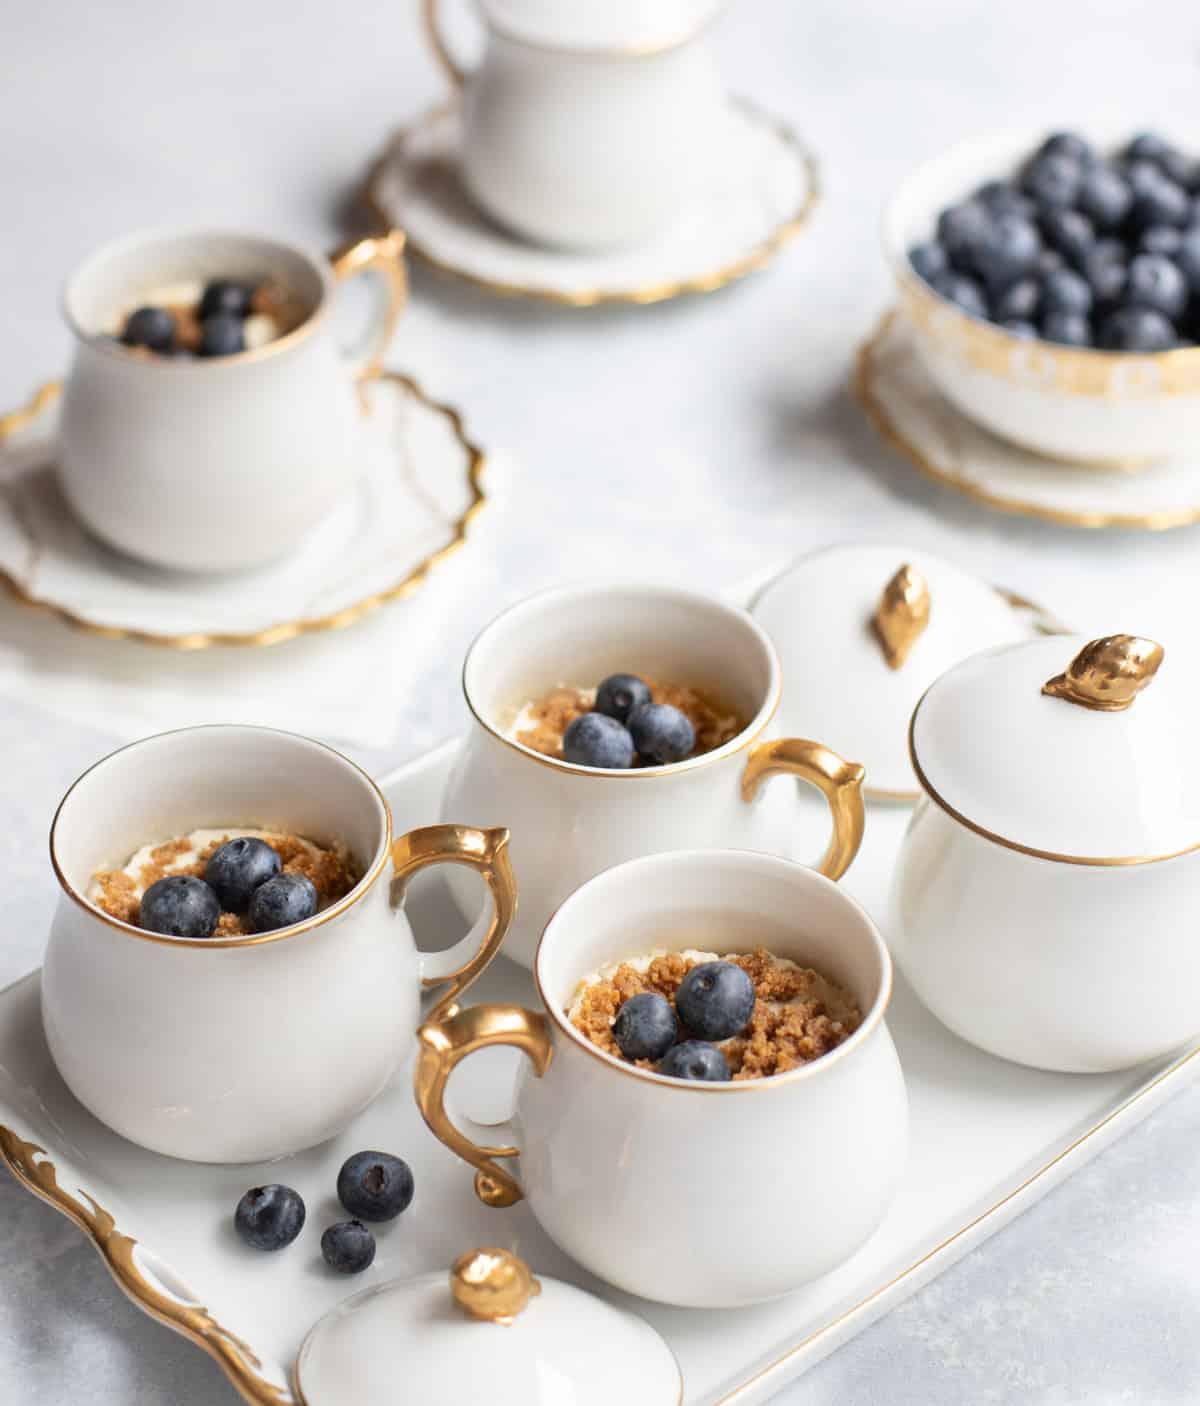 White pots de creme filled with Frozen Lemon Velvet, topped with fresh blueberries